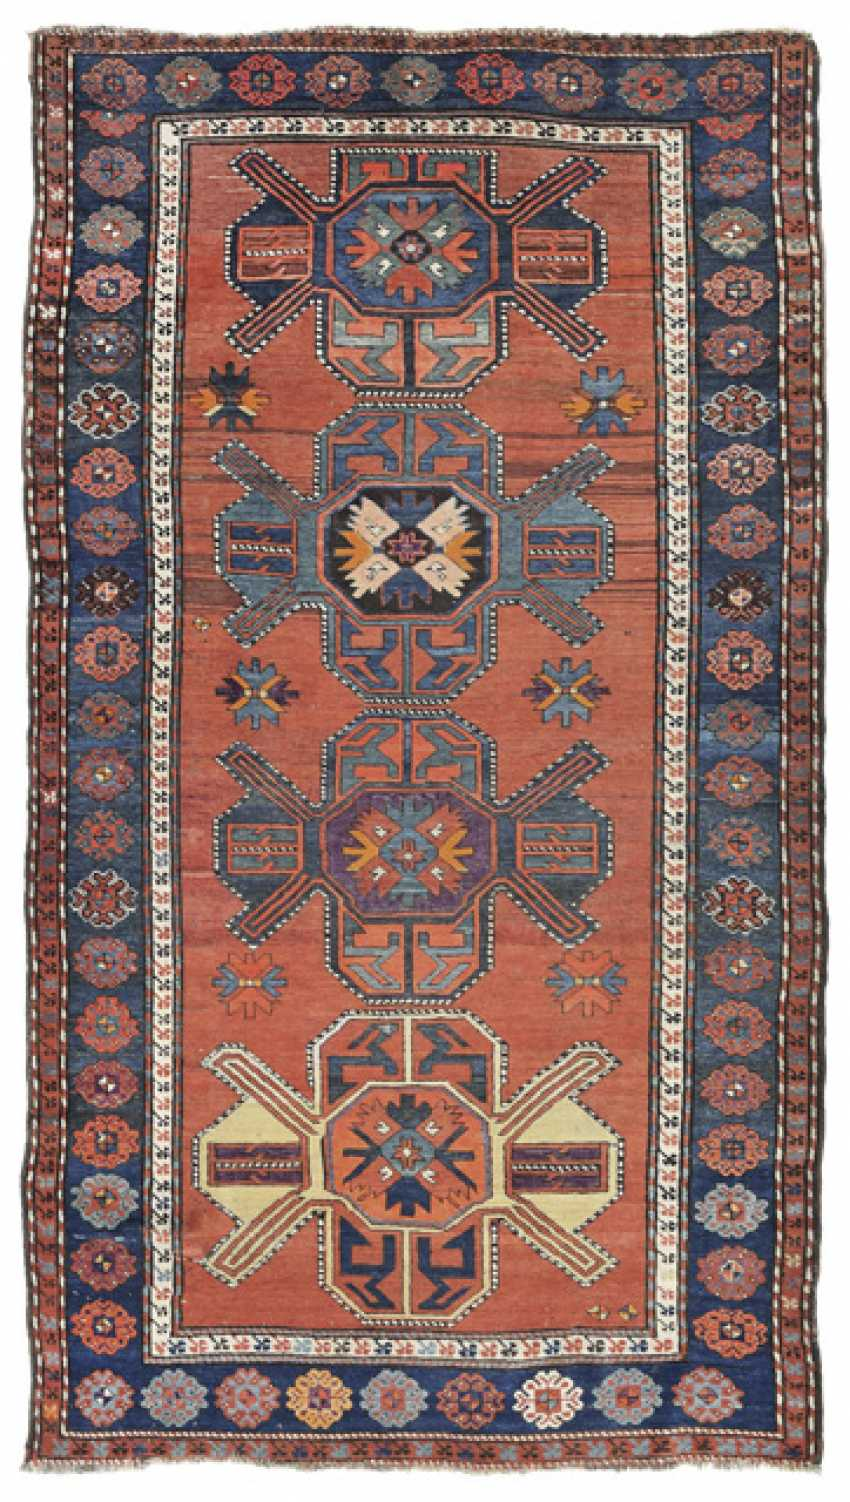 Animal Medallion Carpet. Karabagh area, Caucasus, circa 1910 - photo 1